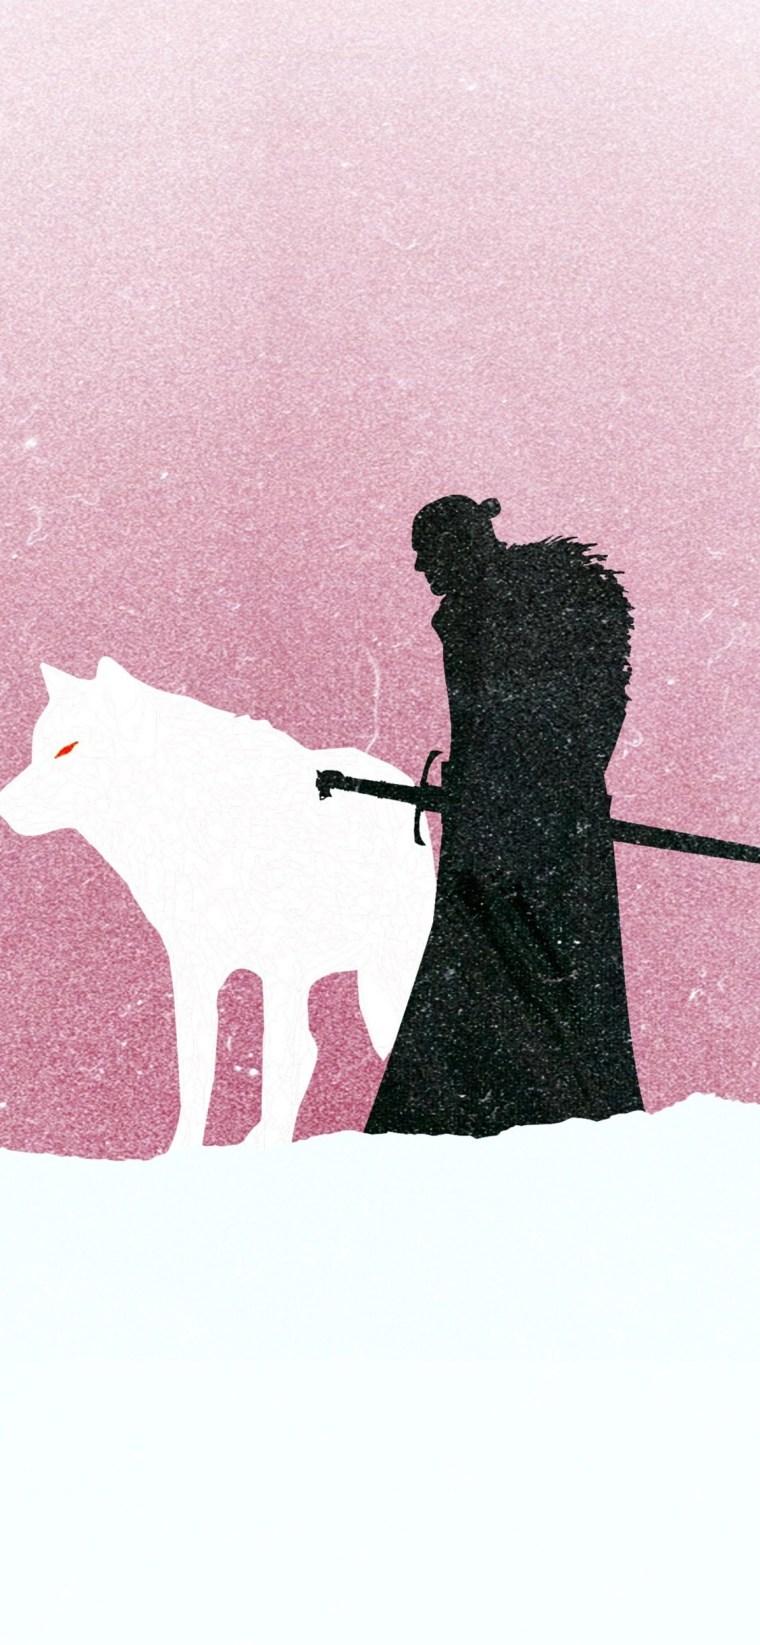 jon-snow-game-of-thrones-minimalism iPhone game of thrones wallpaper